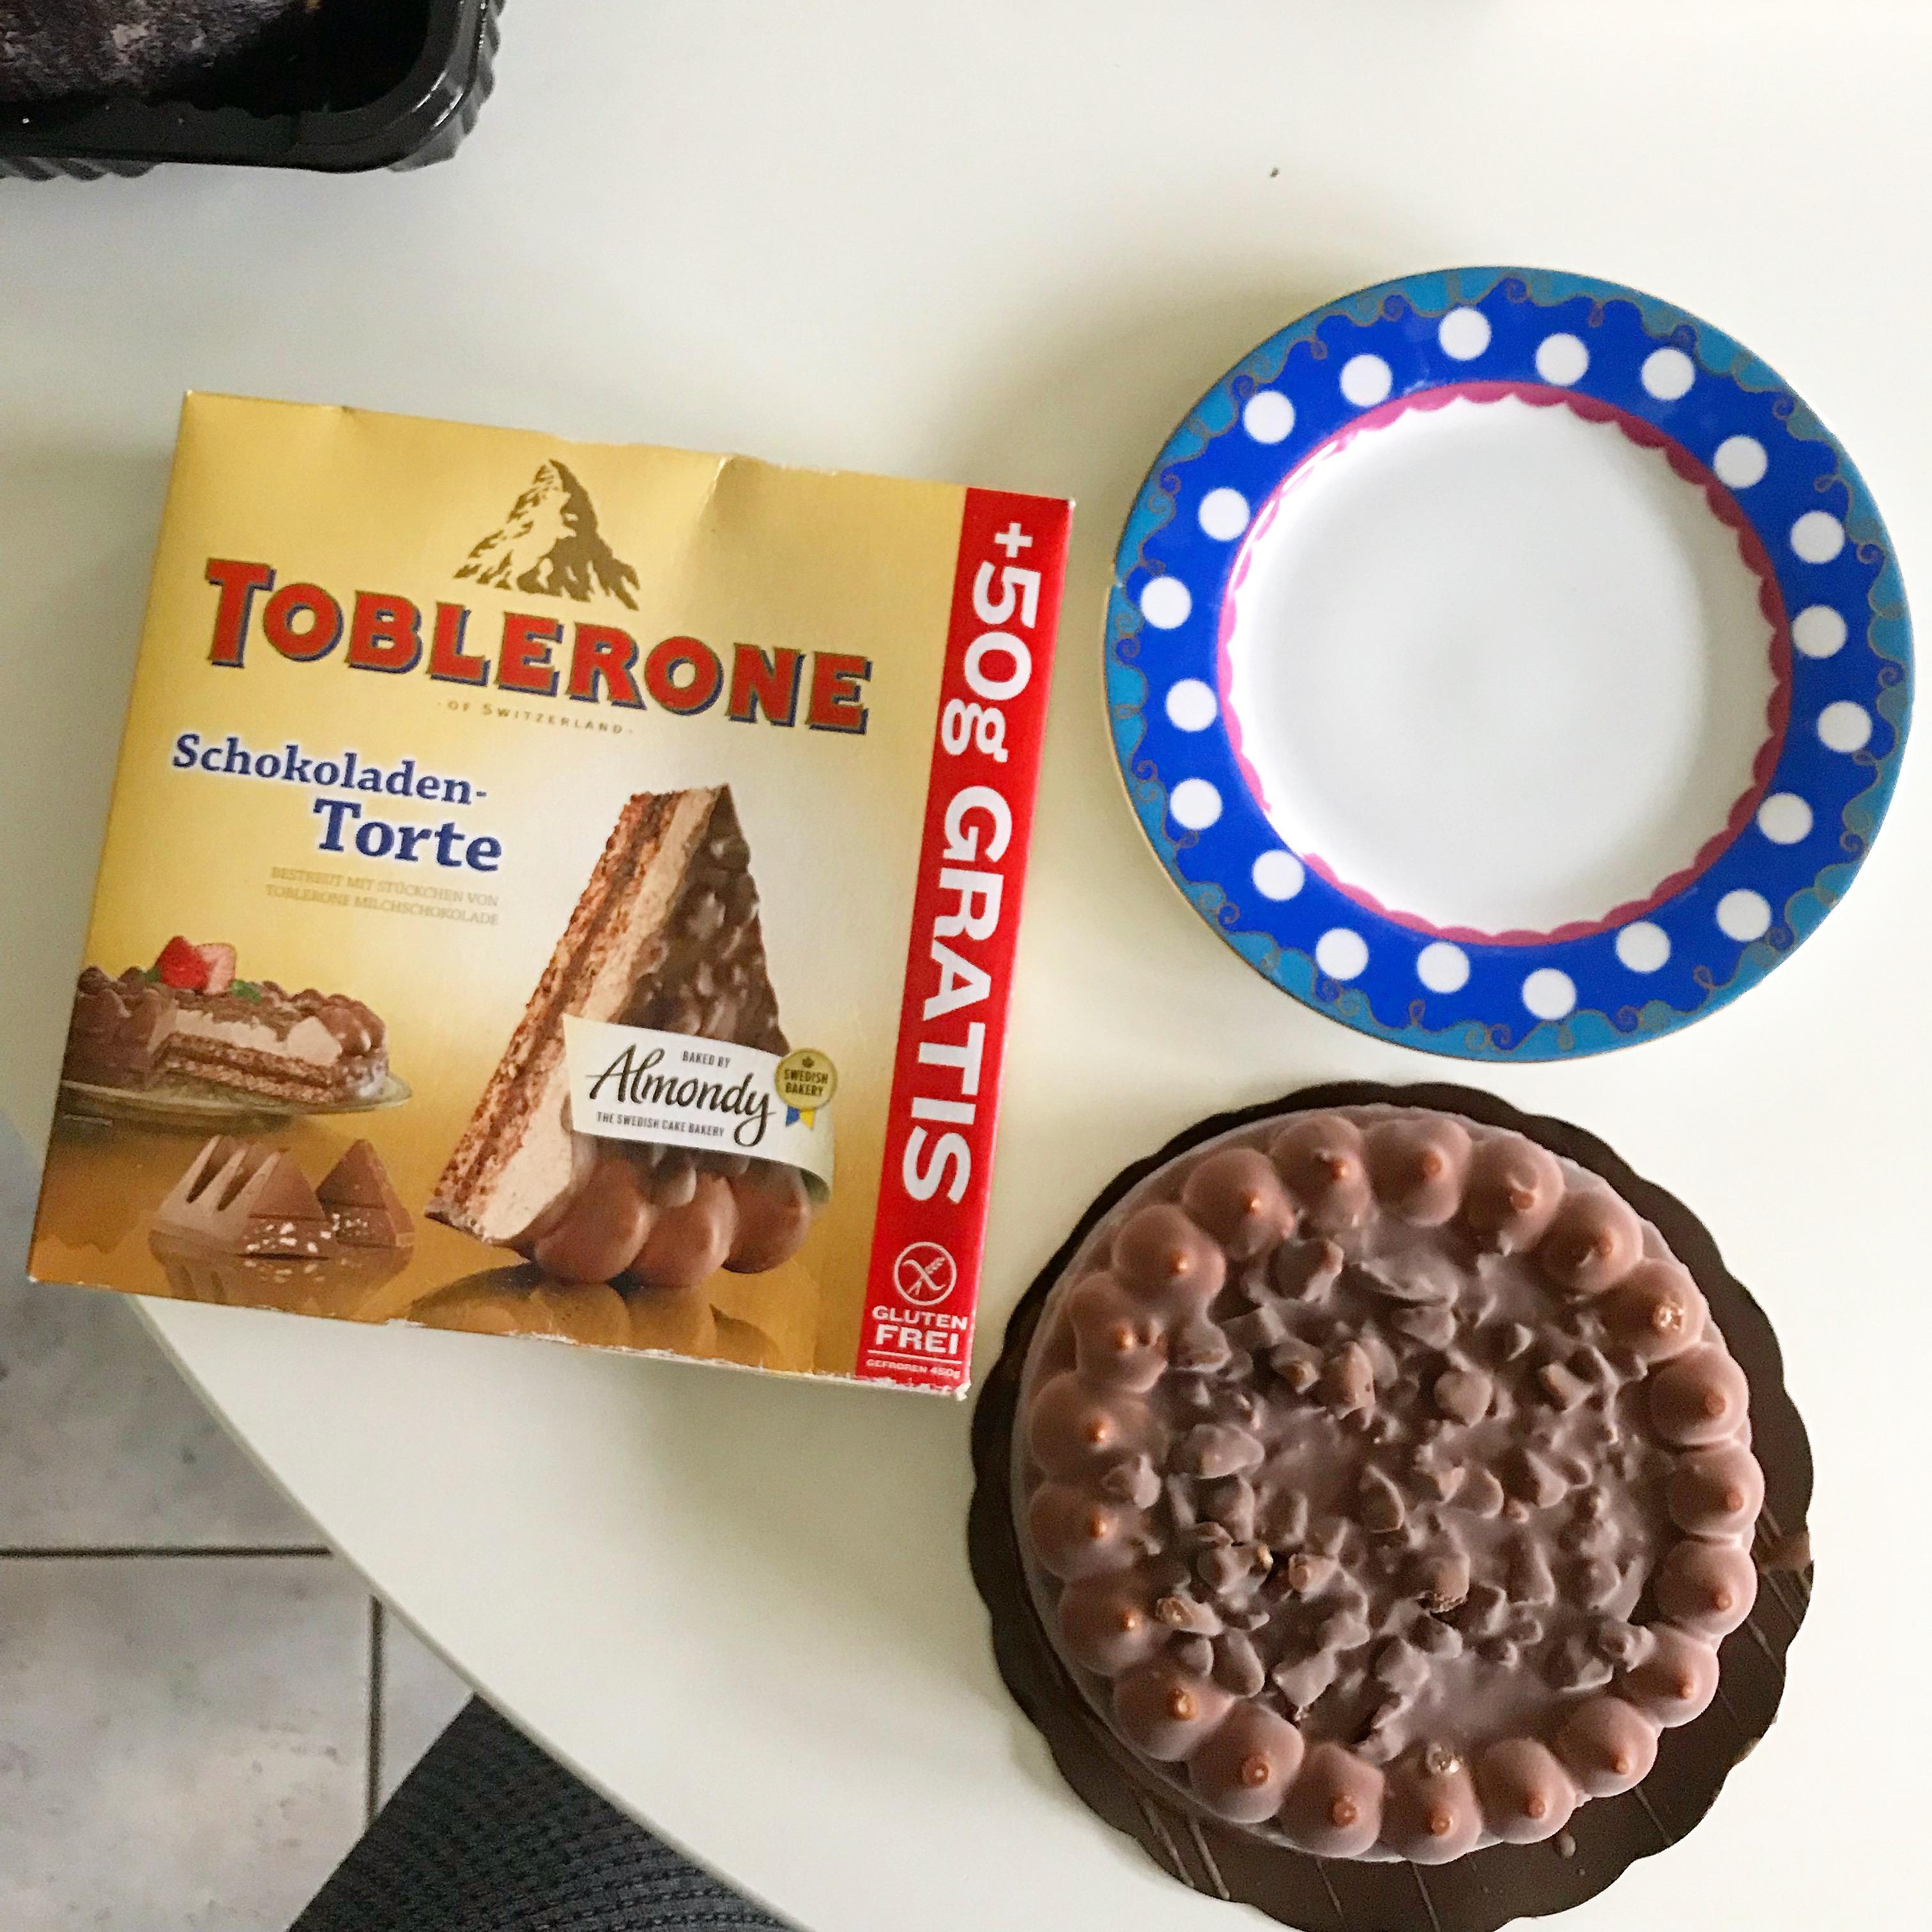 Terug van weggeweest: Toblerone taart @ Lidl